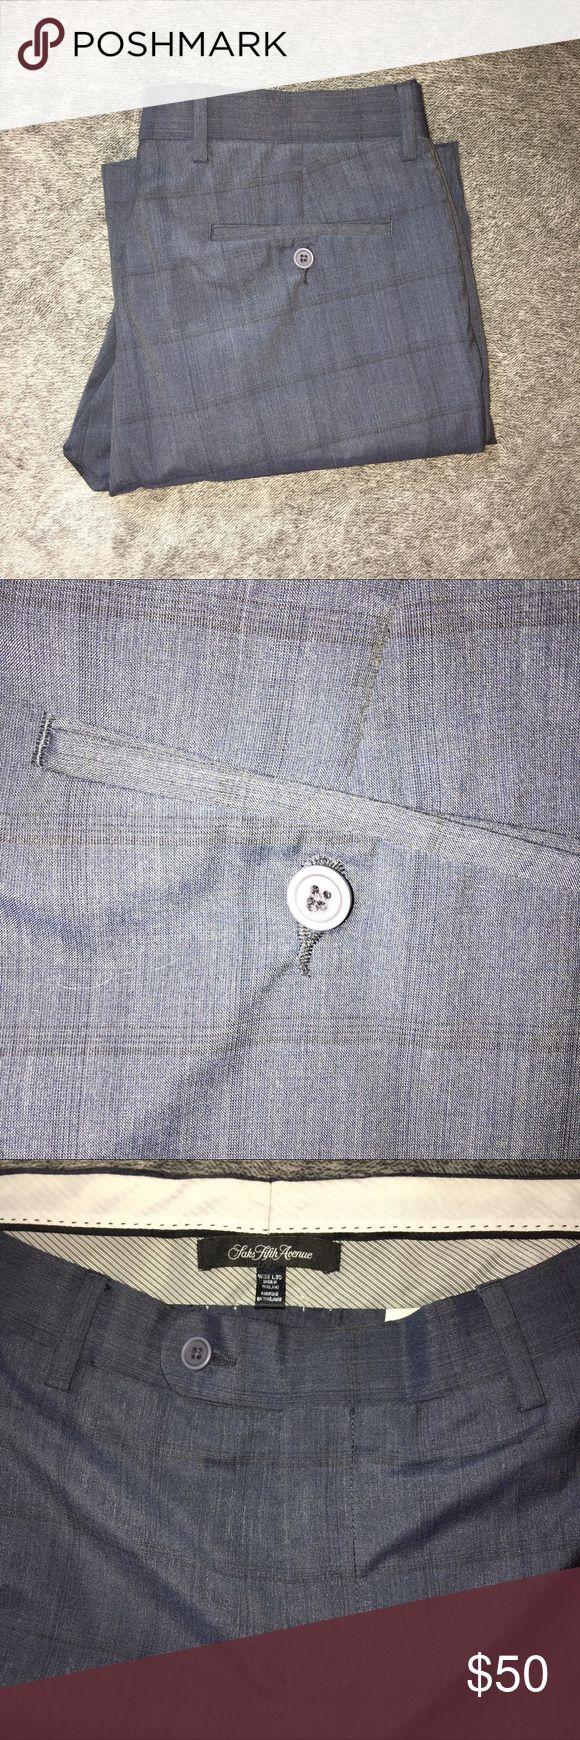 Saks Fifth Avenue Dress Pants Size 32x30 • Saks Fifth Avenue • Plaid Saks Fifth Avenue Pants Dress